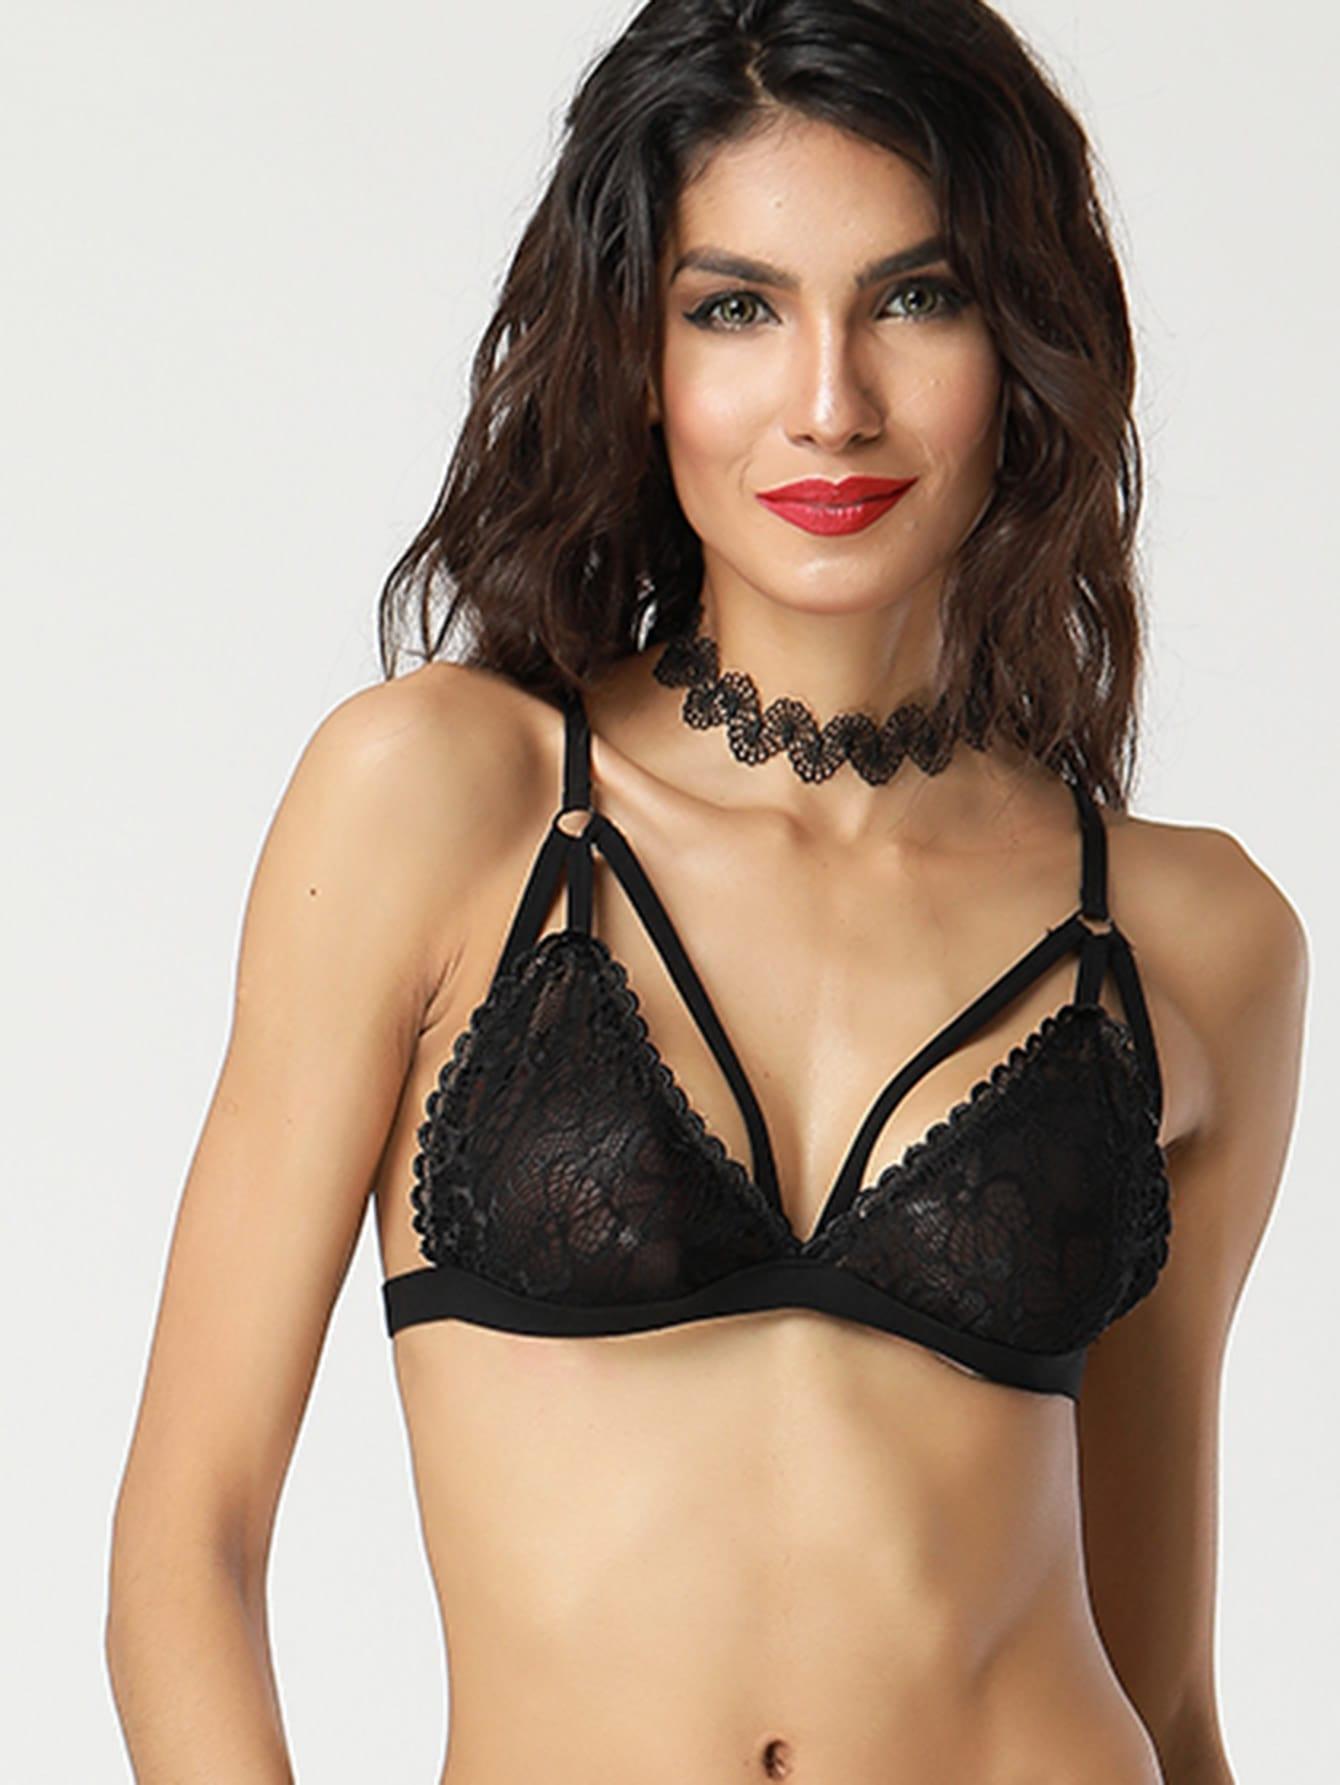 Harness Detail Cross Back Lace Bralette lingerie170703305